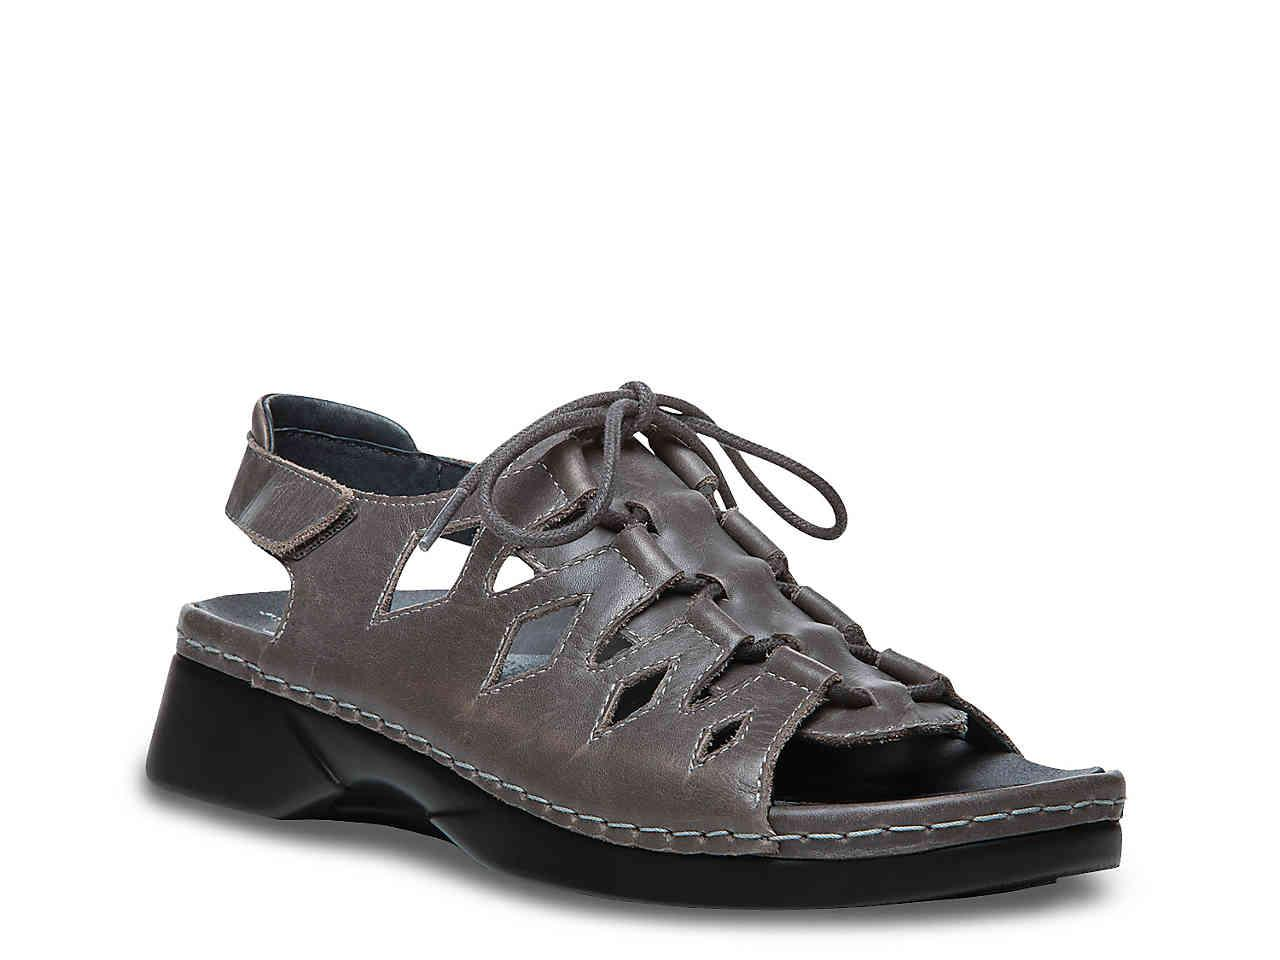 077a2eb777d Lyst - Propet Ghillie Walker Gladiator Sandal in Gray